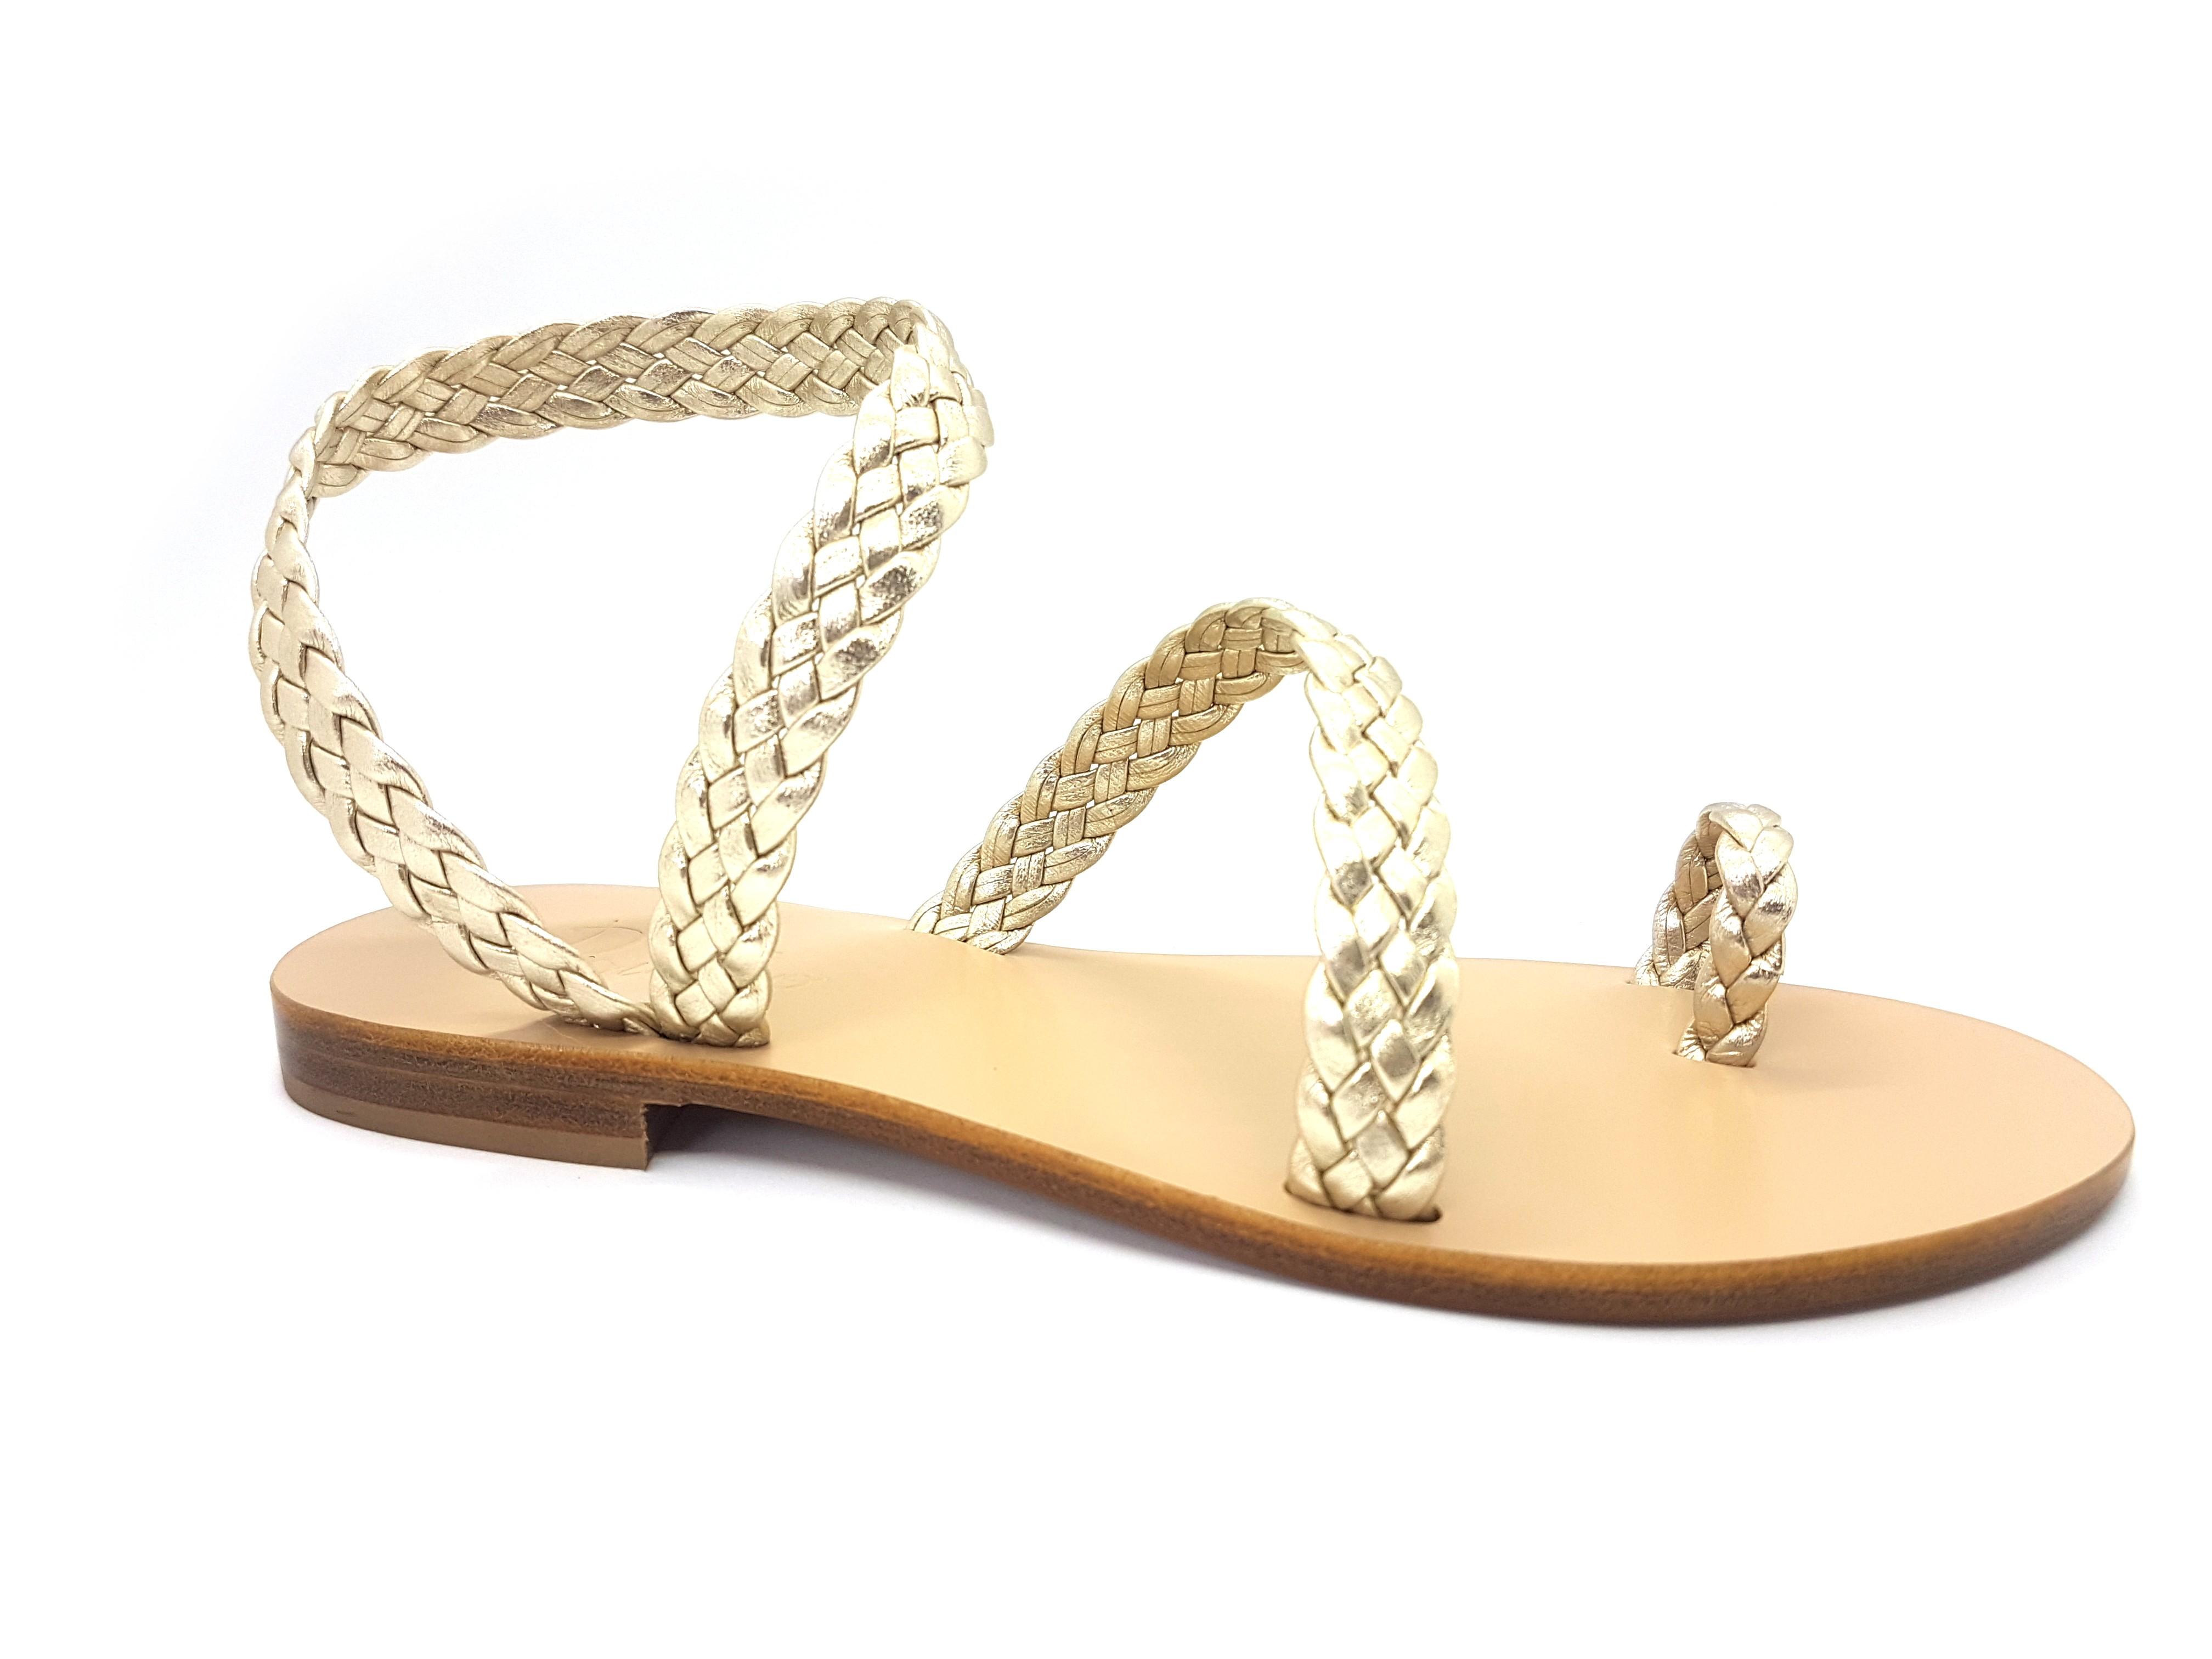 Tr1804 Treccia Kalos Sandals Sandalo Infradito b6Ygyf7